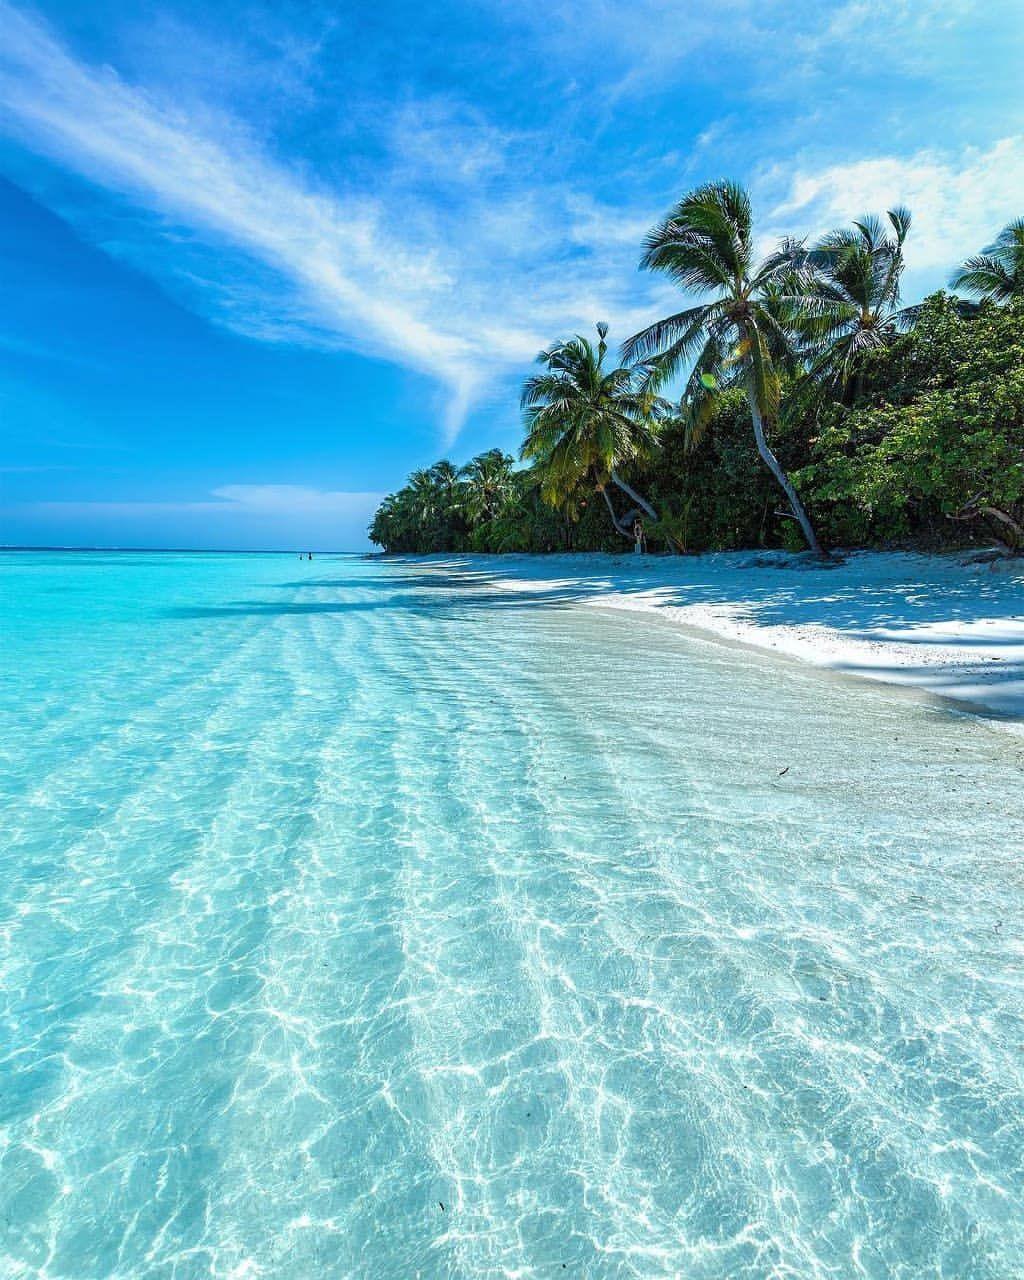 Maldives Beach: Tag Someone You Would Discover Maldives @nature Paradise